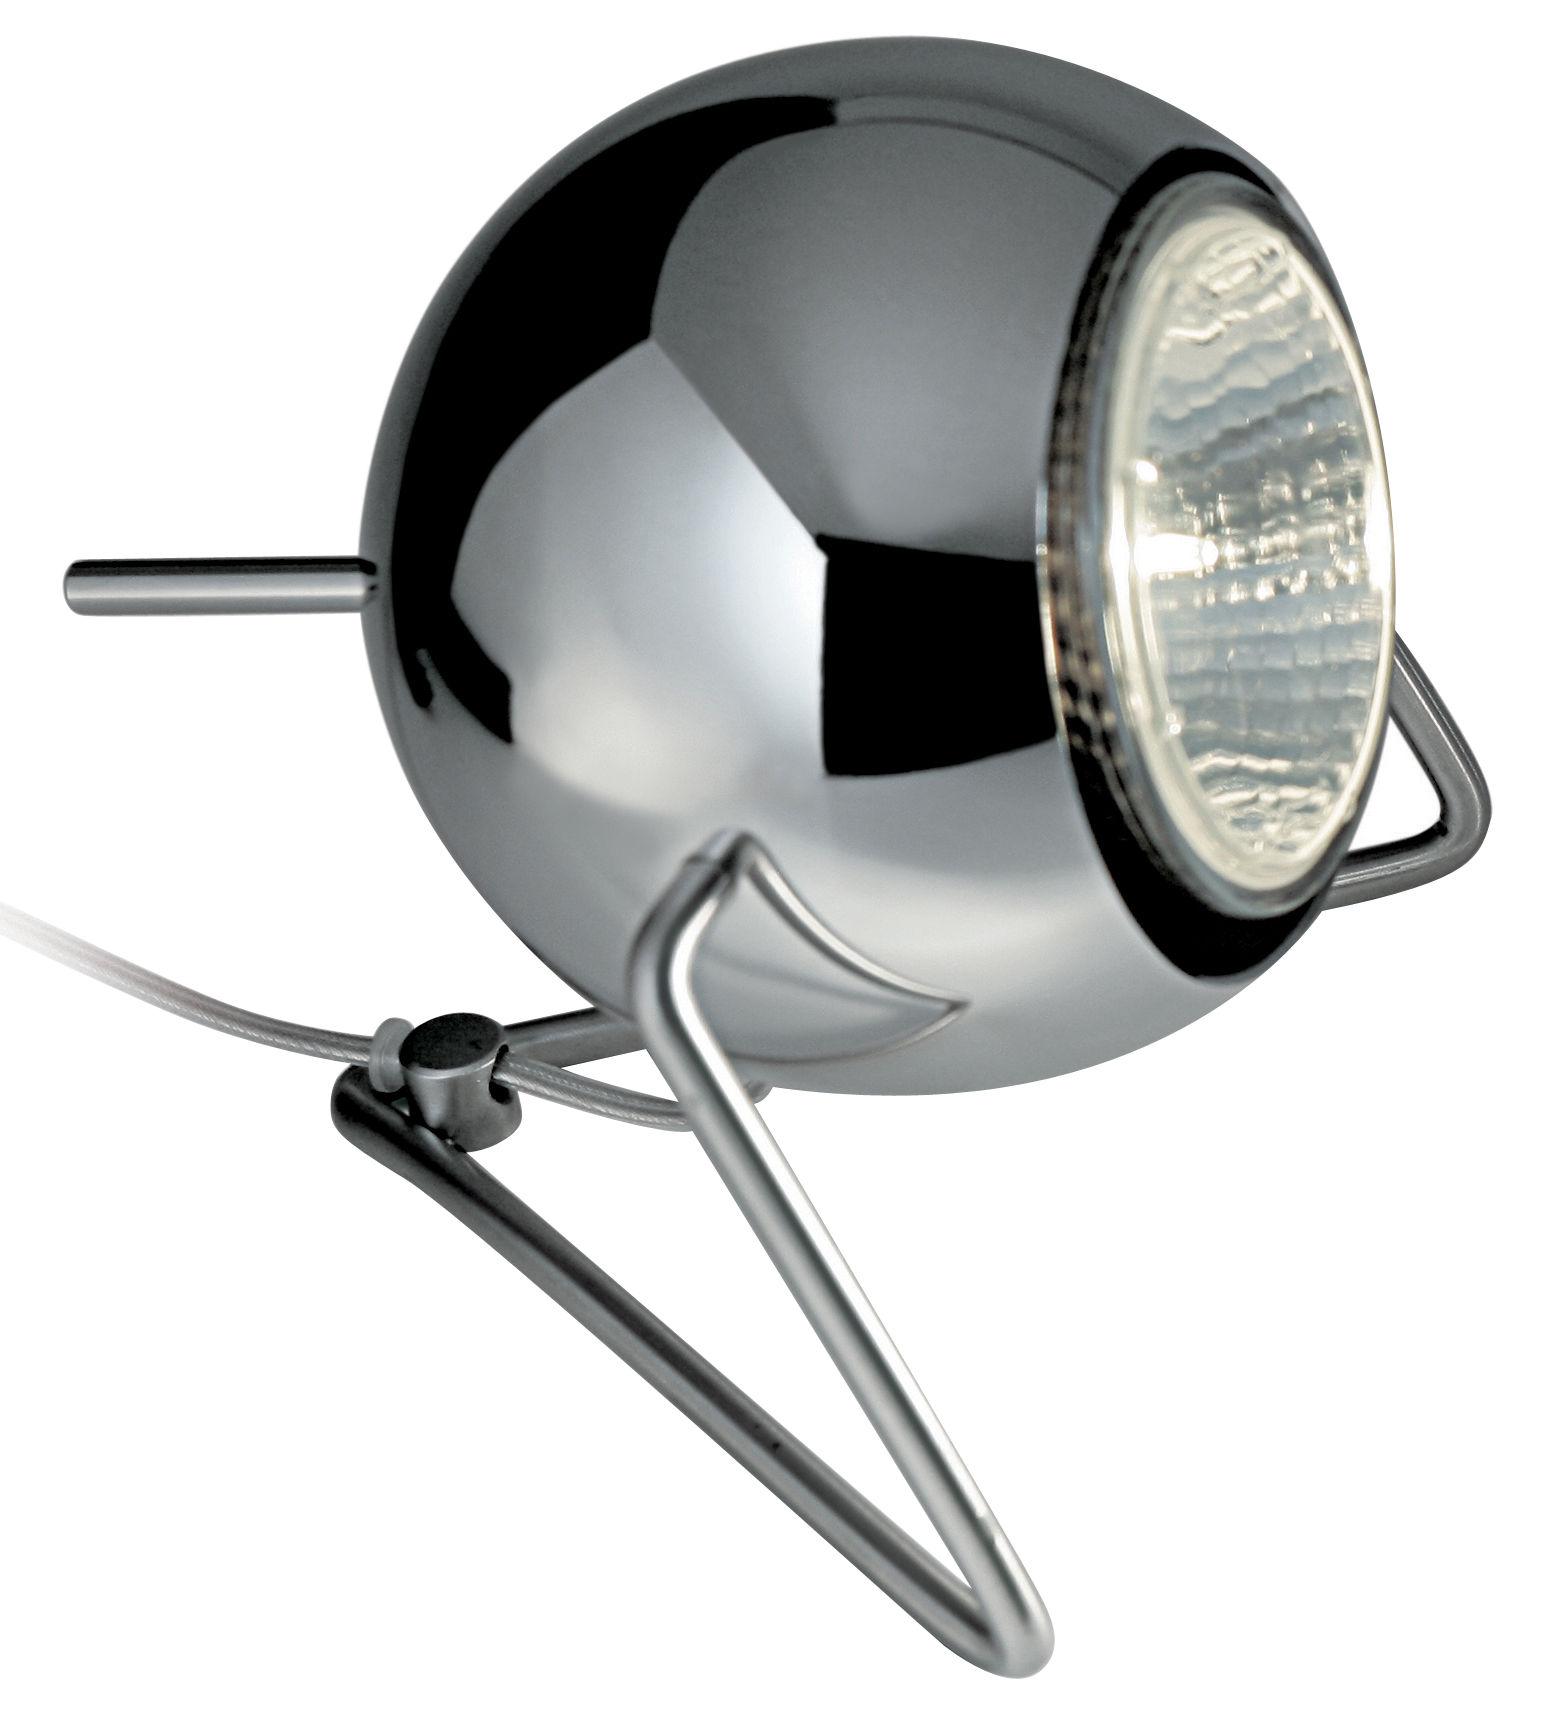 Lighting - Table Lamps - Beluga Table lamp - Metal version by Fabbian - chromed - Chromed metal